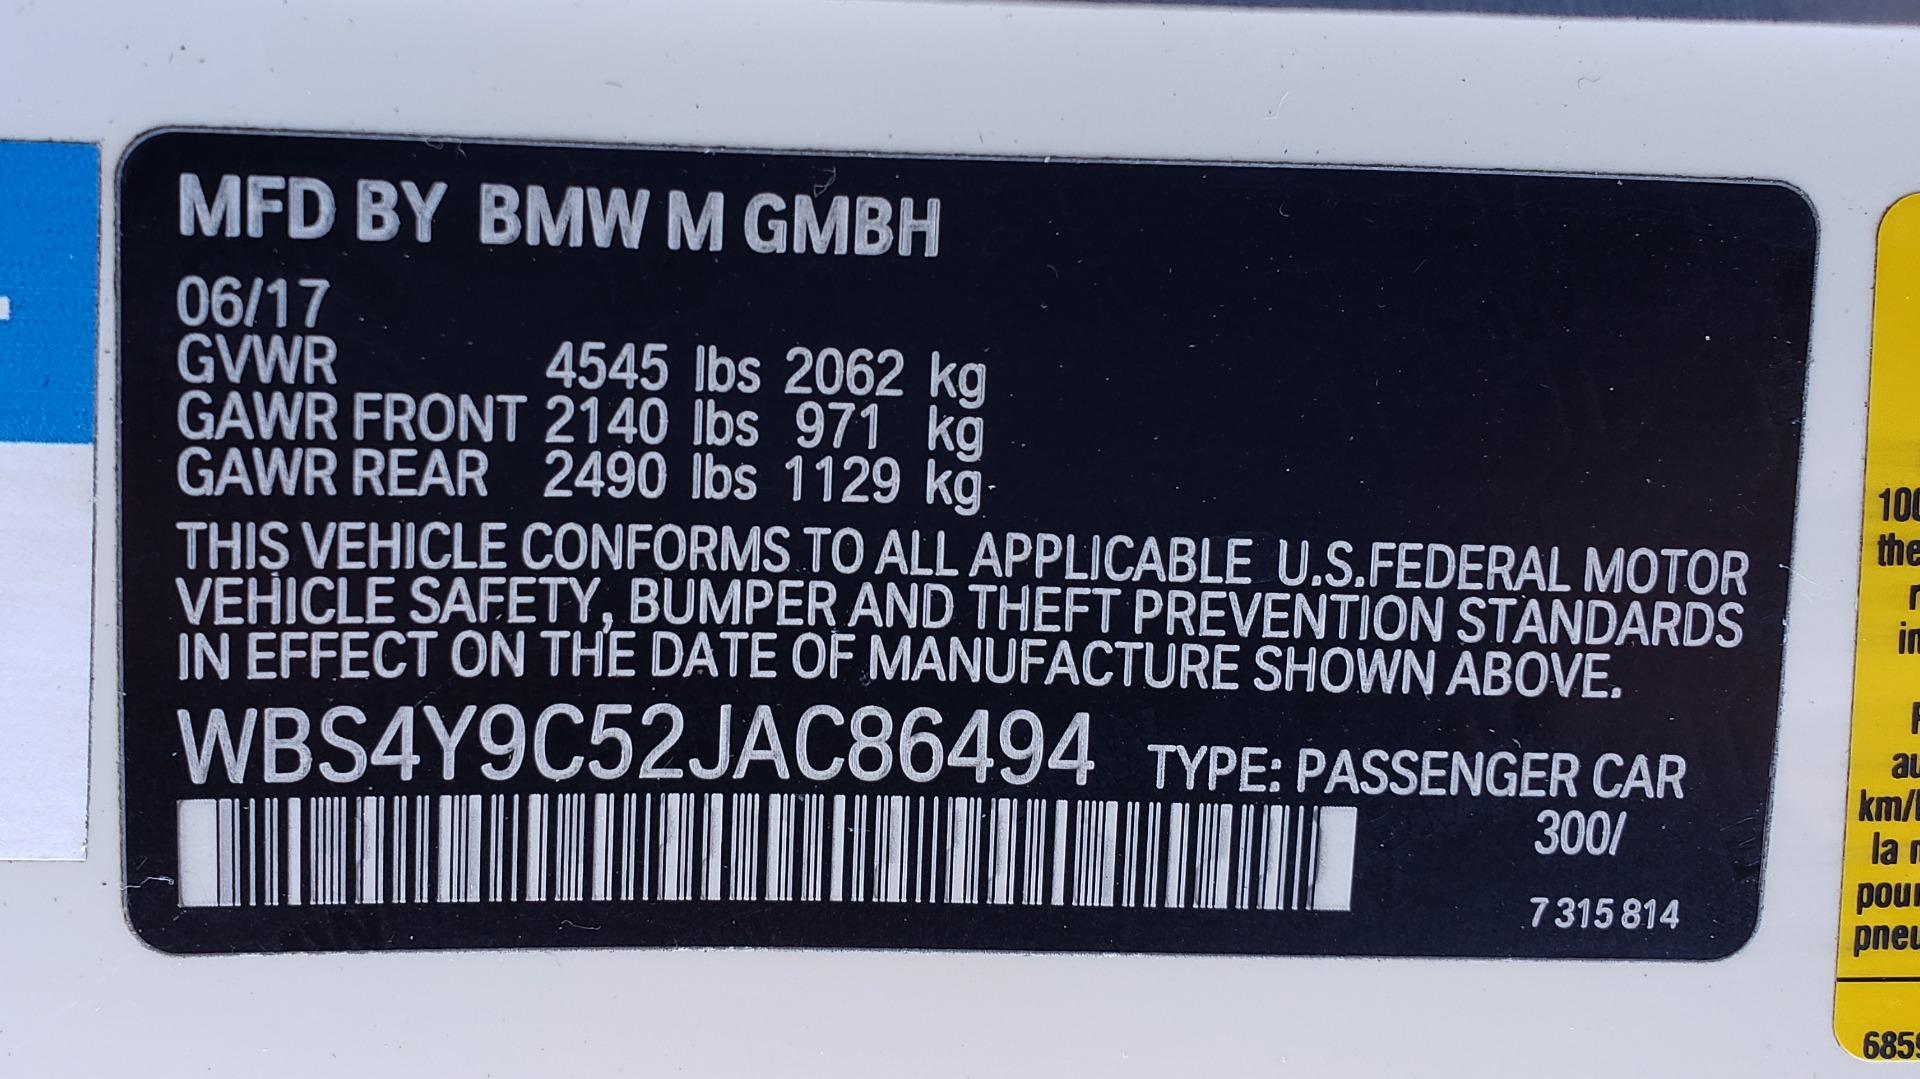 Used 2018 BMW M4 COMP PKG / EXEC / M-DRIVER / PARK CNTRL / ACTIVE BLIND SPOT for sale Sold at Formula Imports in Charlotte NC 28227 73